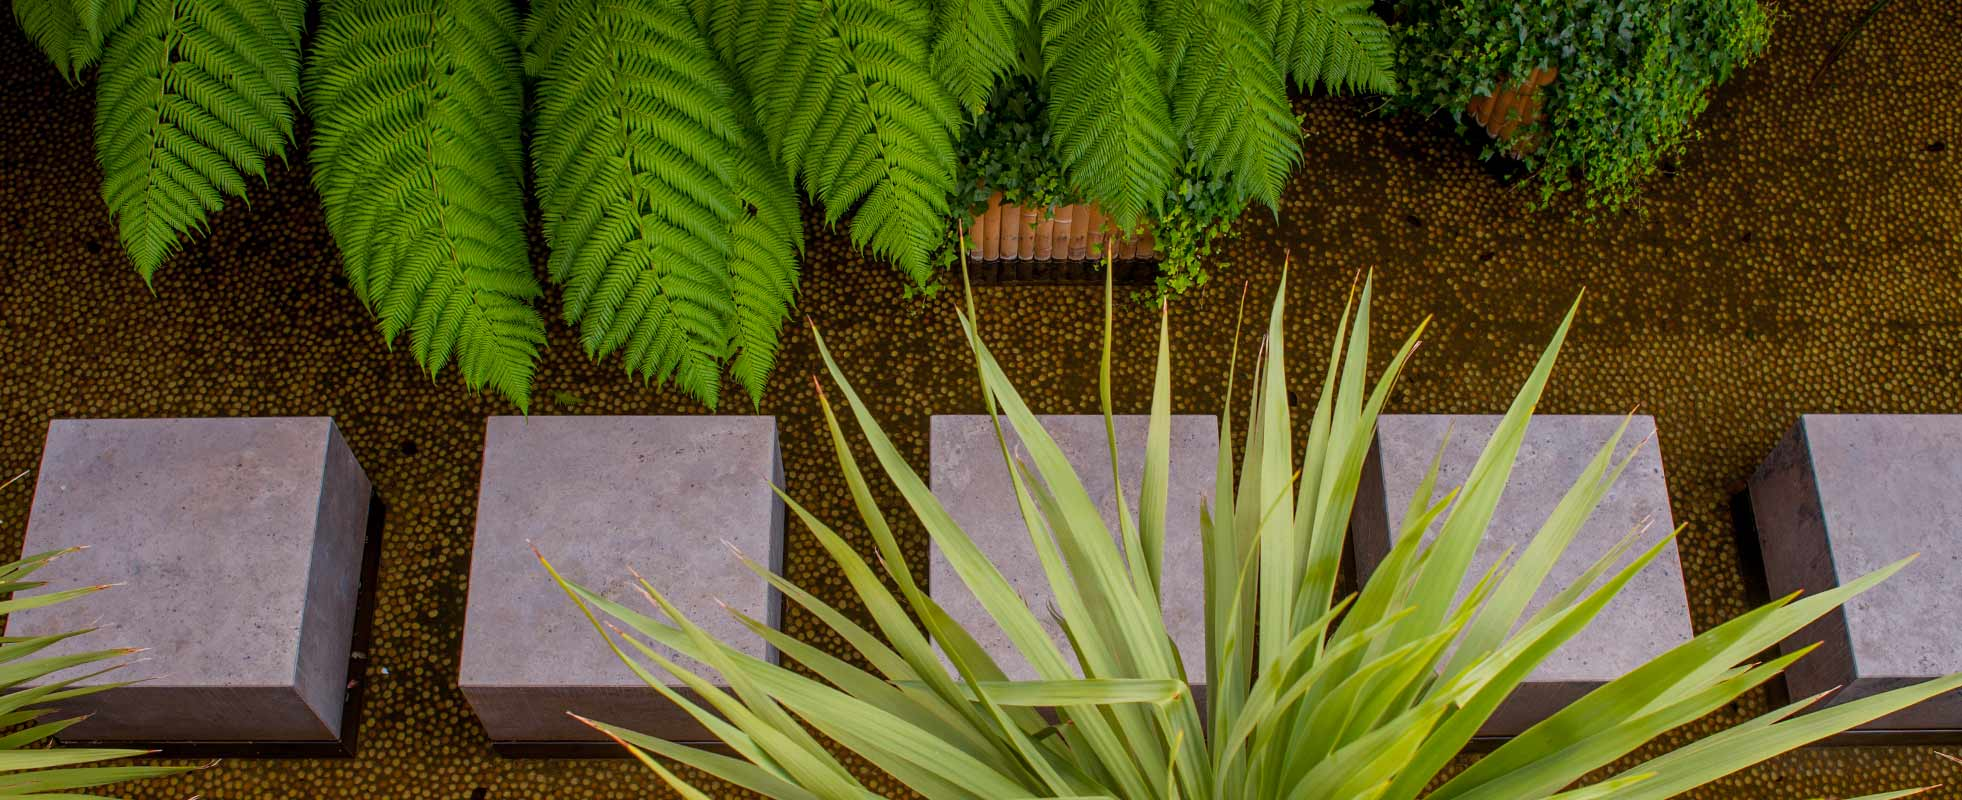 Garden Design and Best Landscaping dublin Irelamd